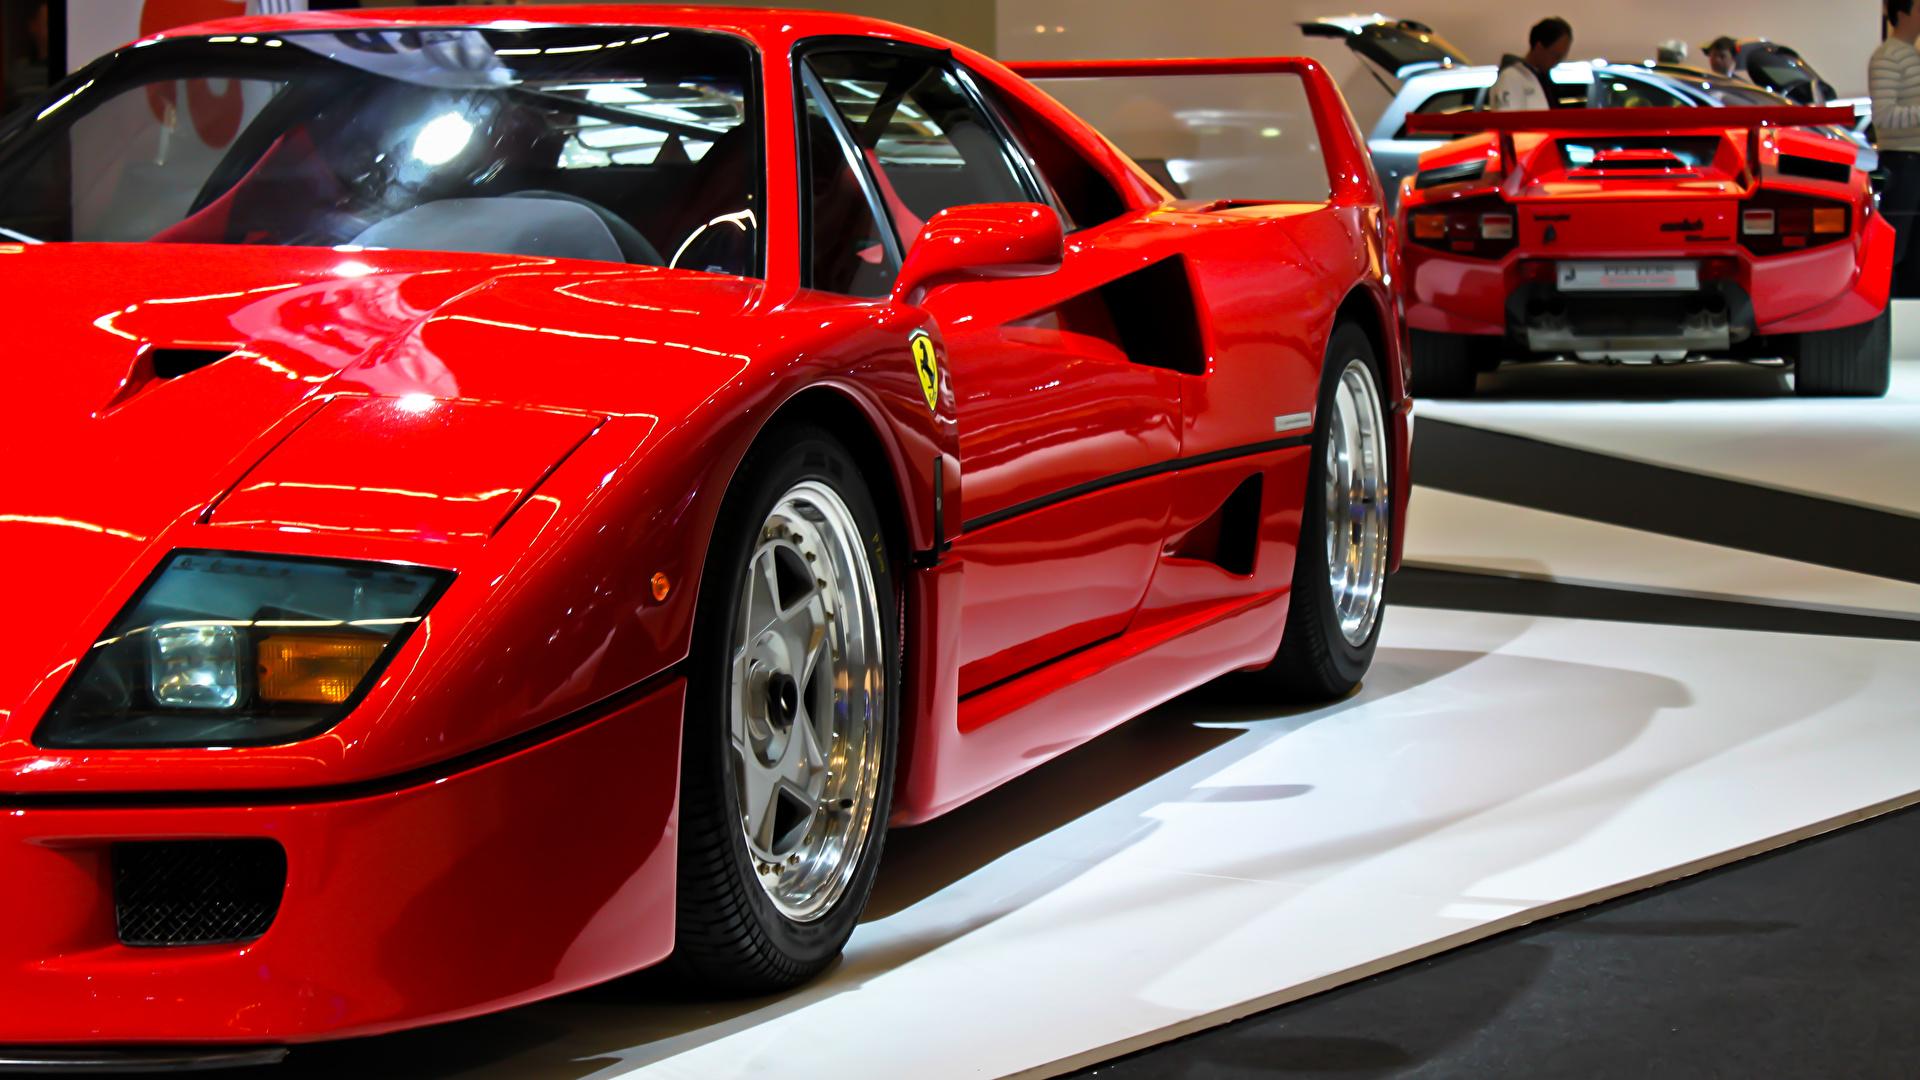 Desktop Hintergrundbilder Ferrari F40 Rot Autos 1920x1080